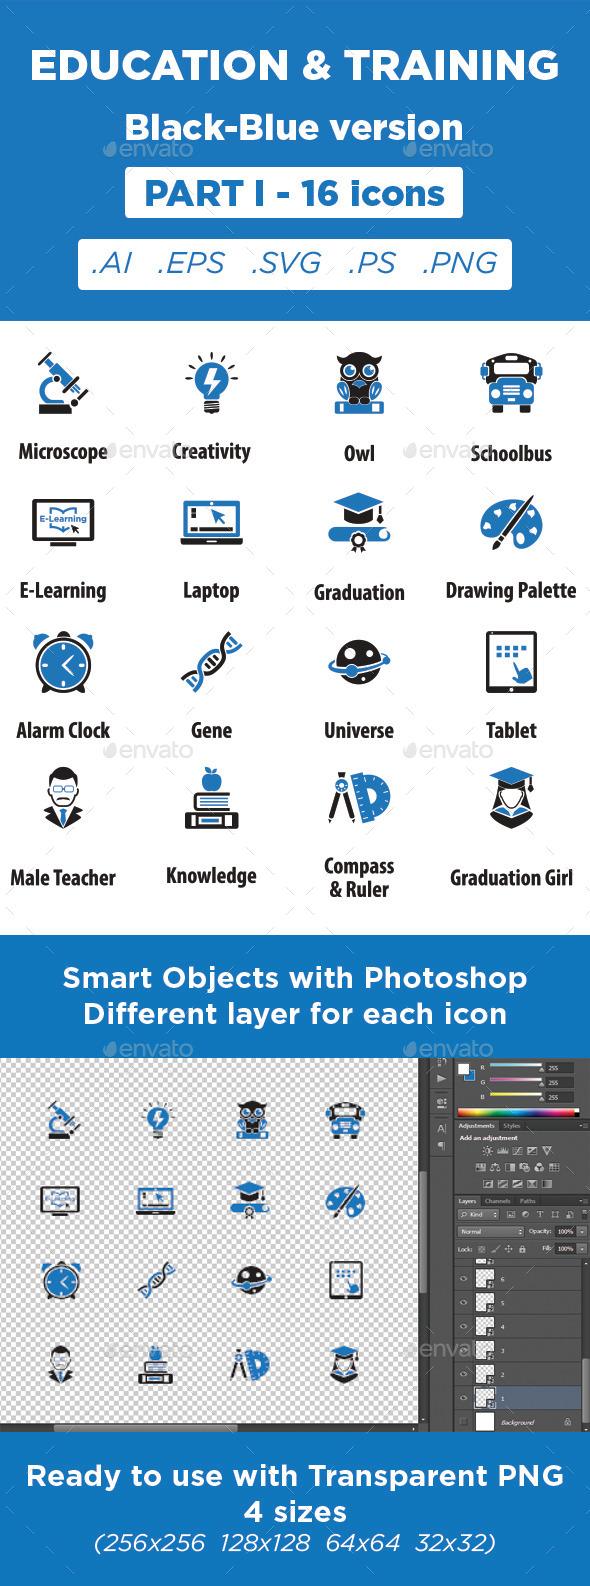 GraphicRiver Education & Training Icons Black-Blue Part 1 11373053